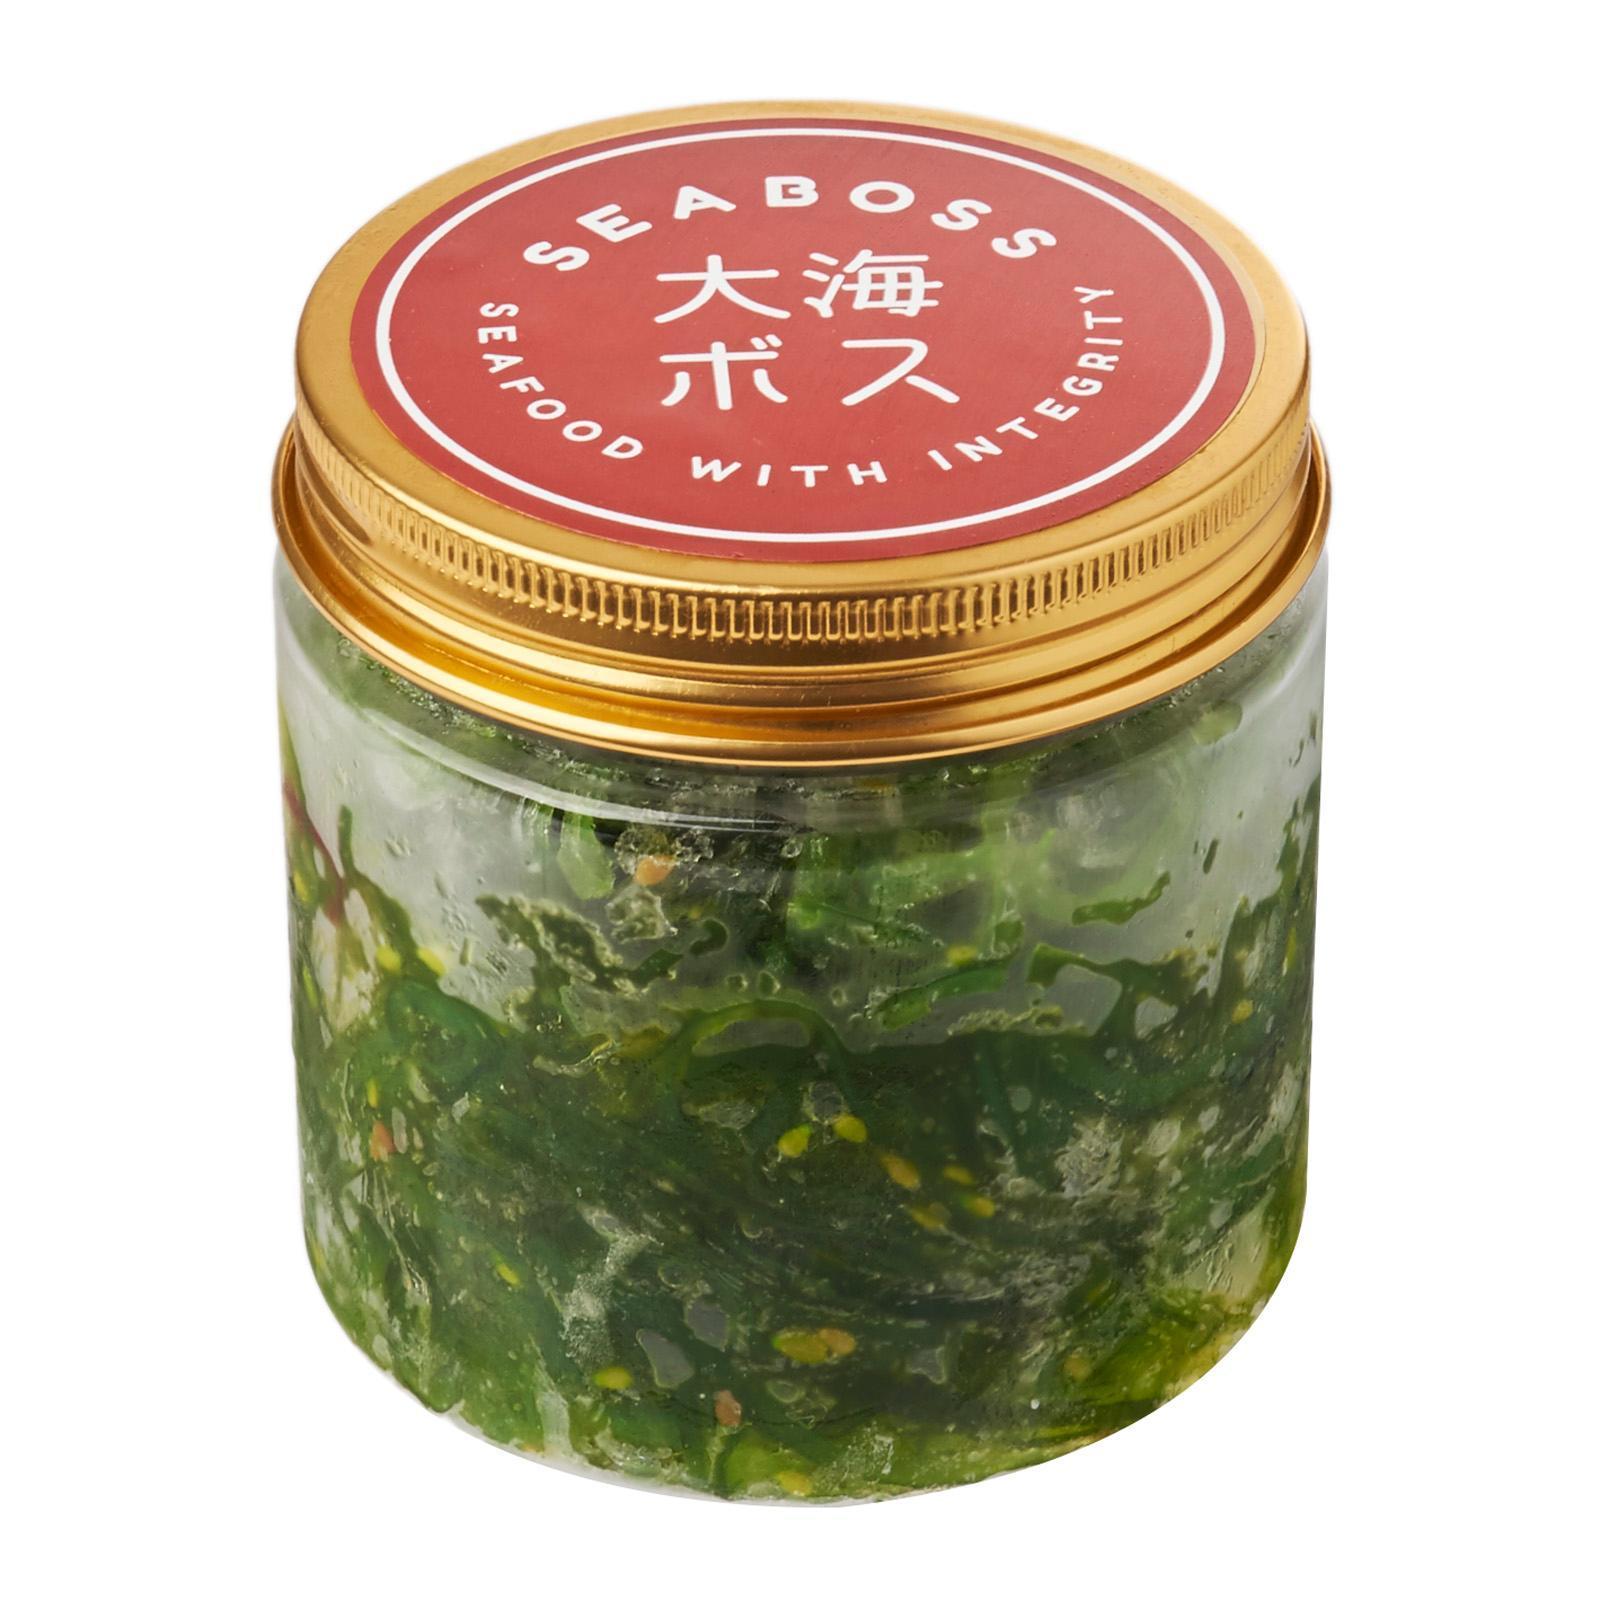 SEABOSS Chuka Wakame (Seasoned Sesame Seaweed Salad) - Frozen